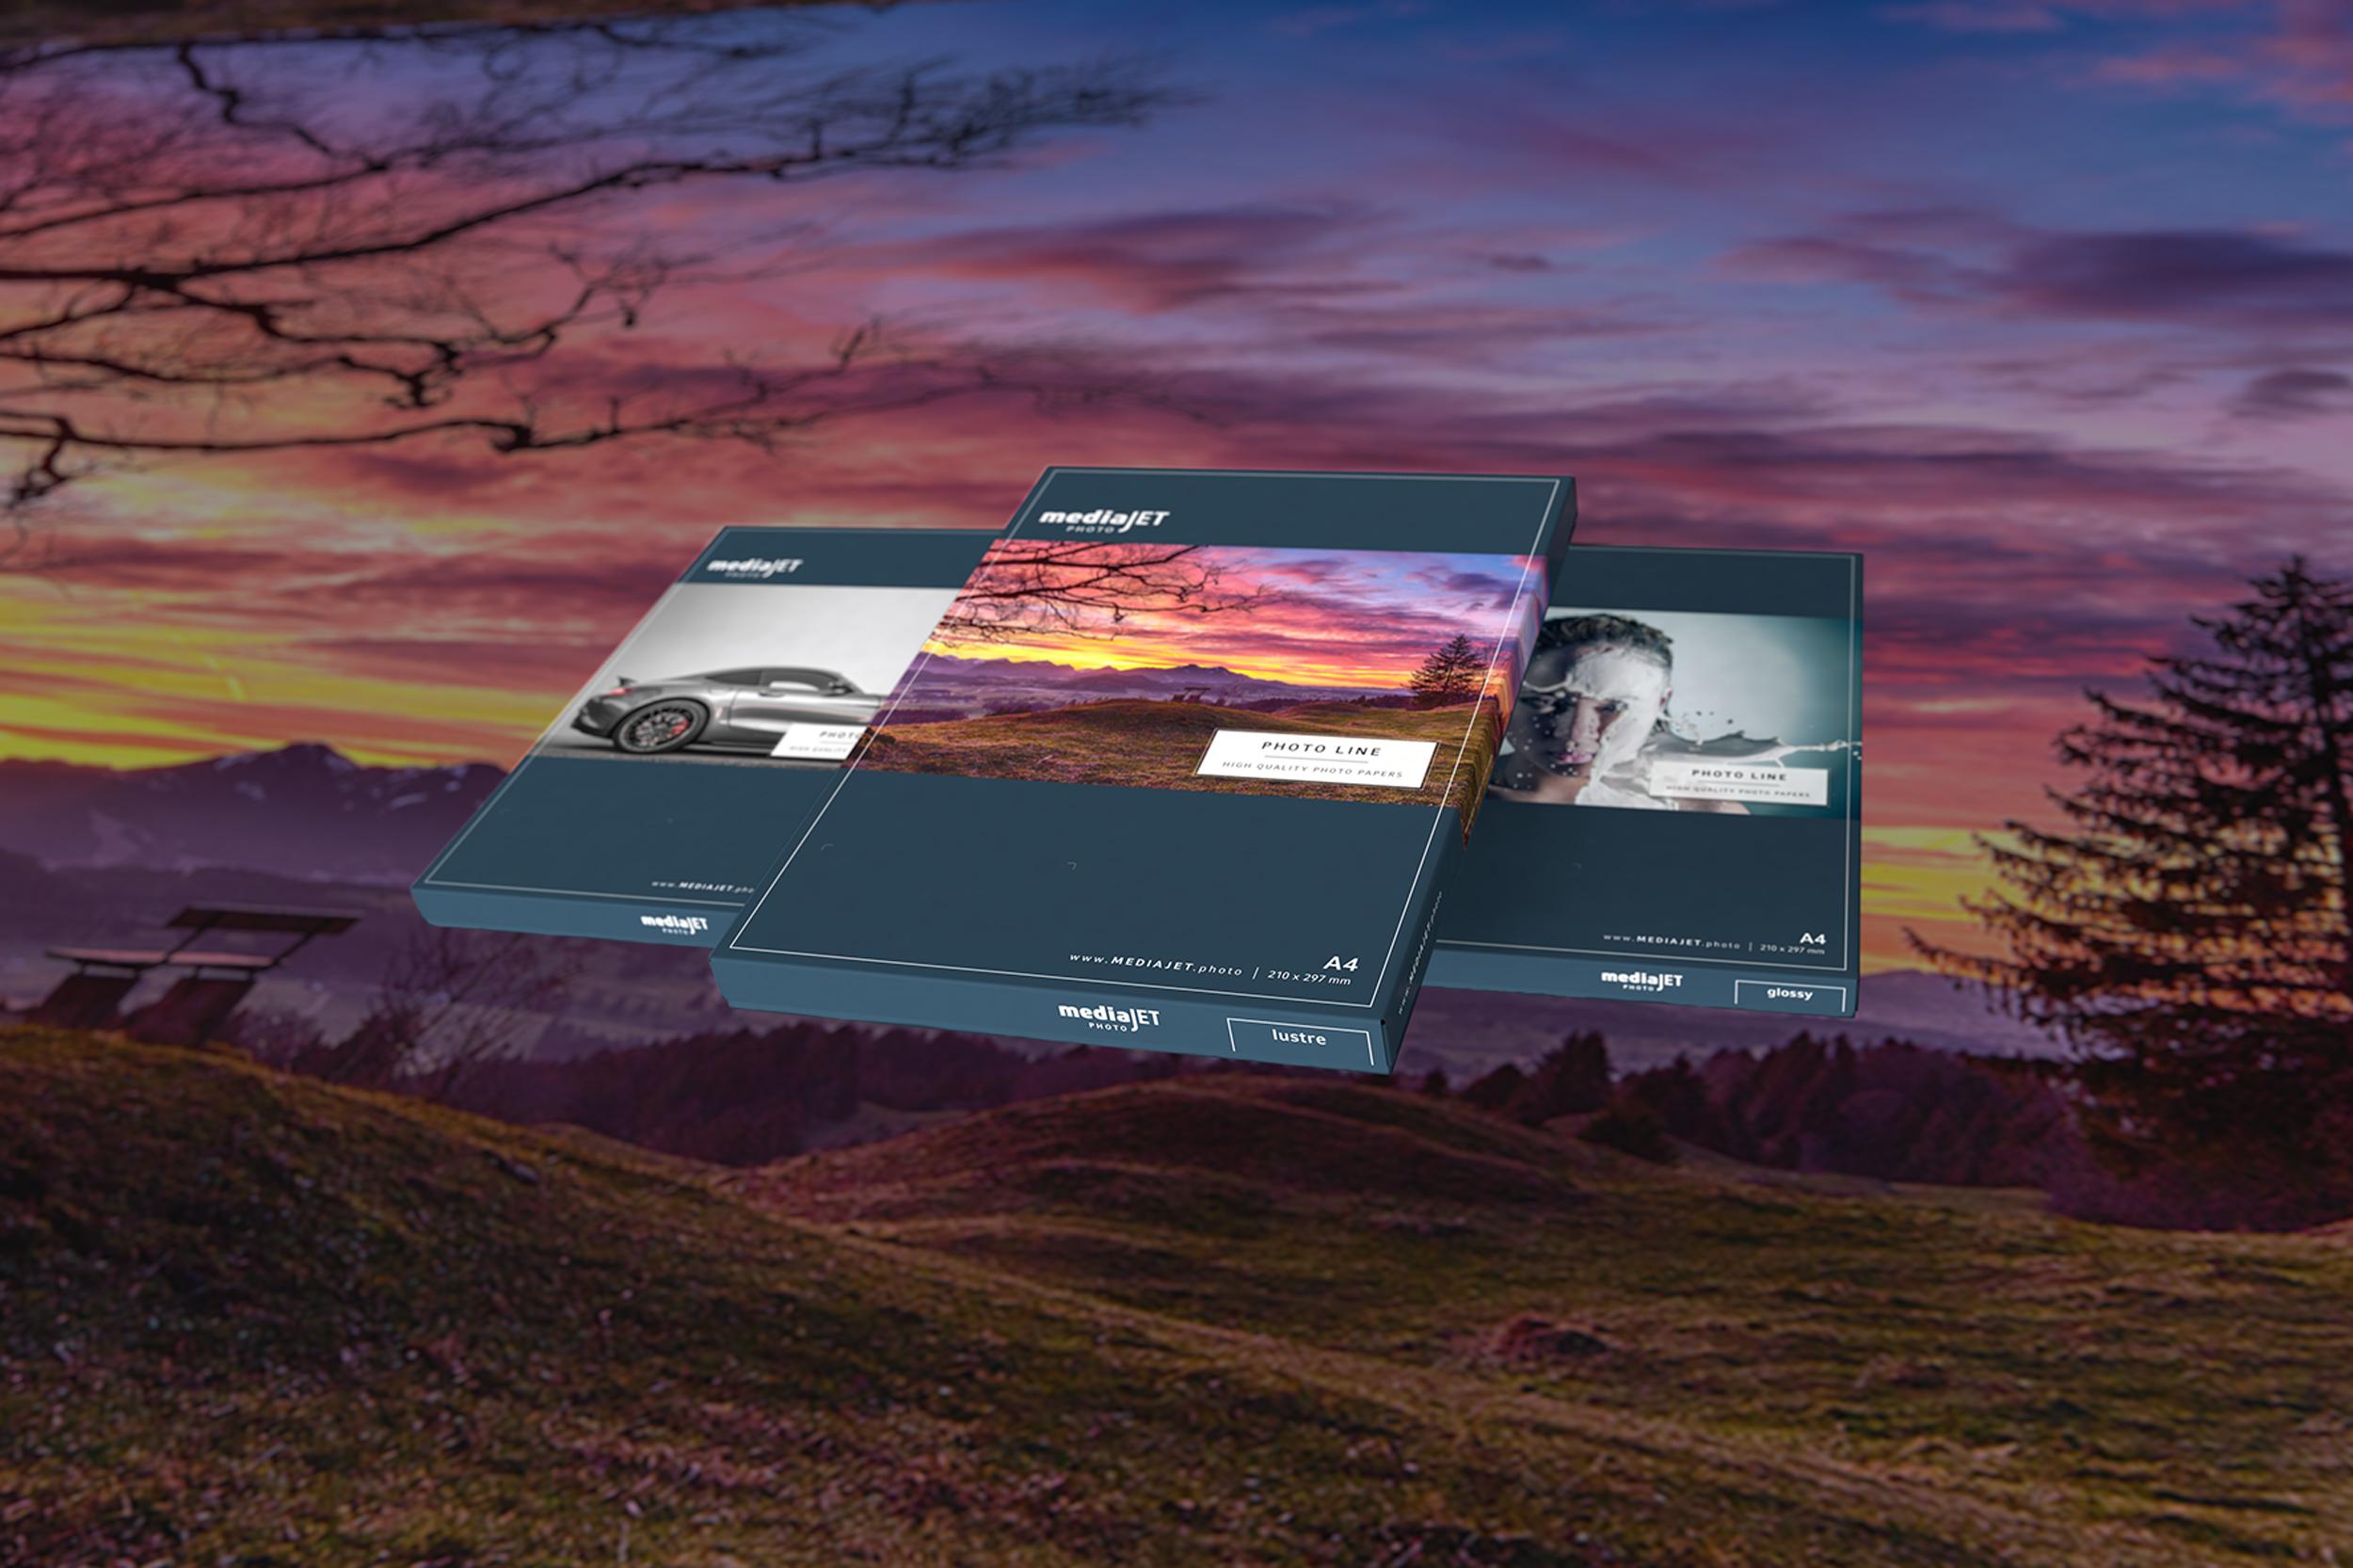 RA_CGI_Schachteln_3er-Gruppe_mitHG-dunkel_photo_lustre_2500px